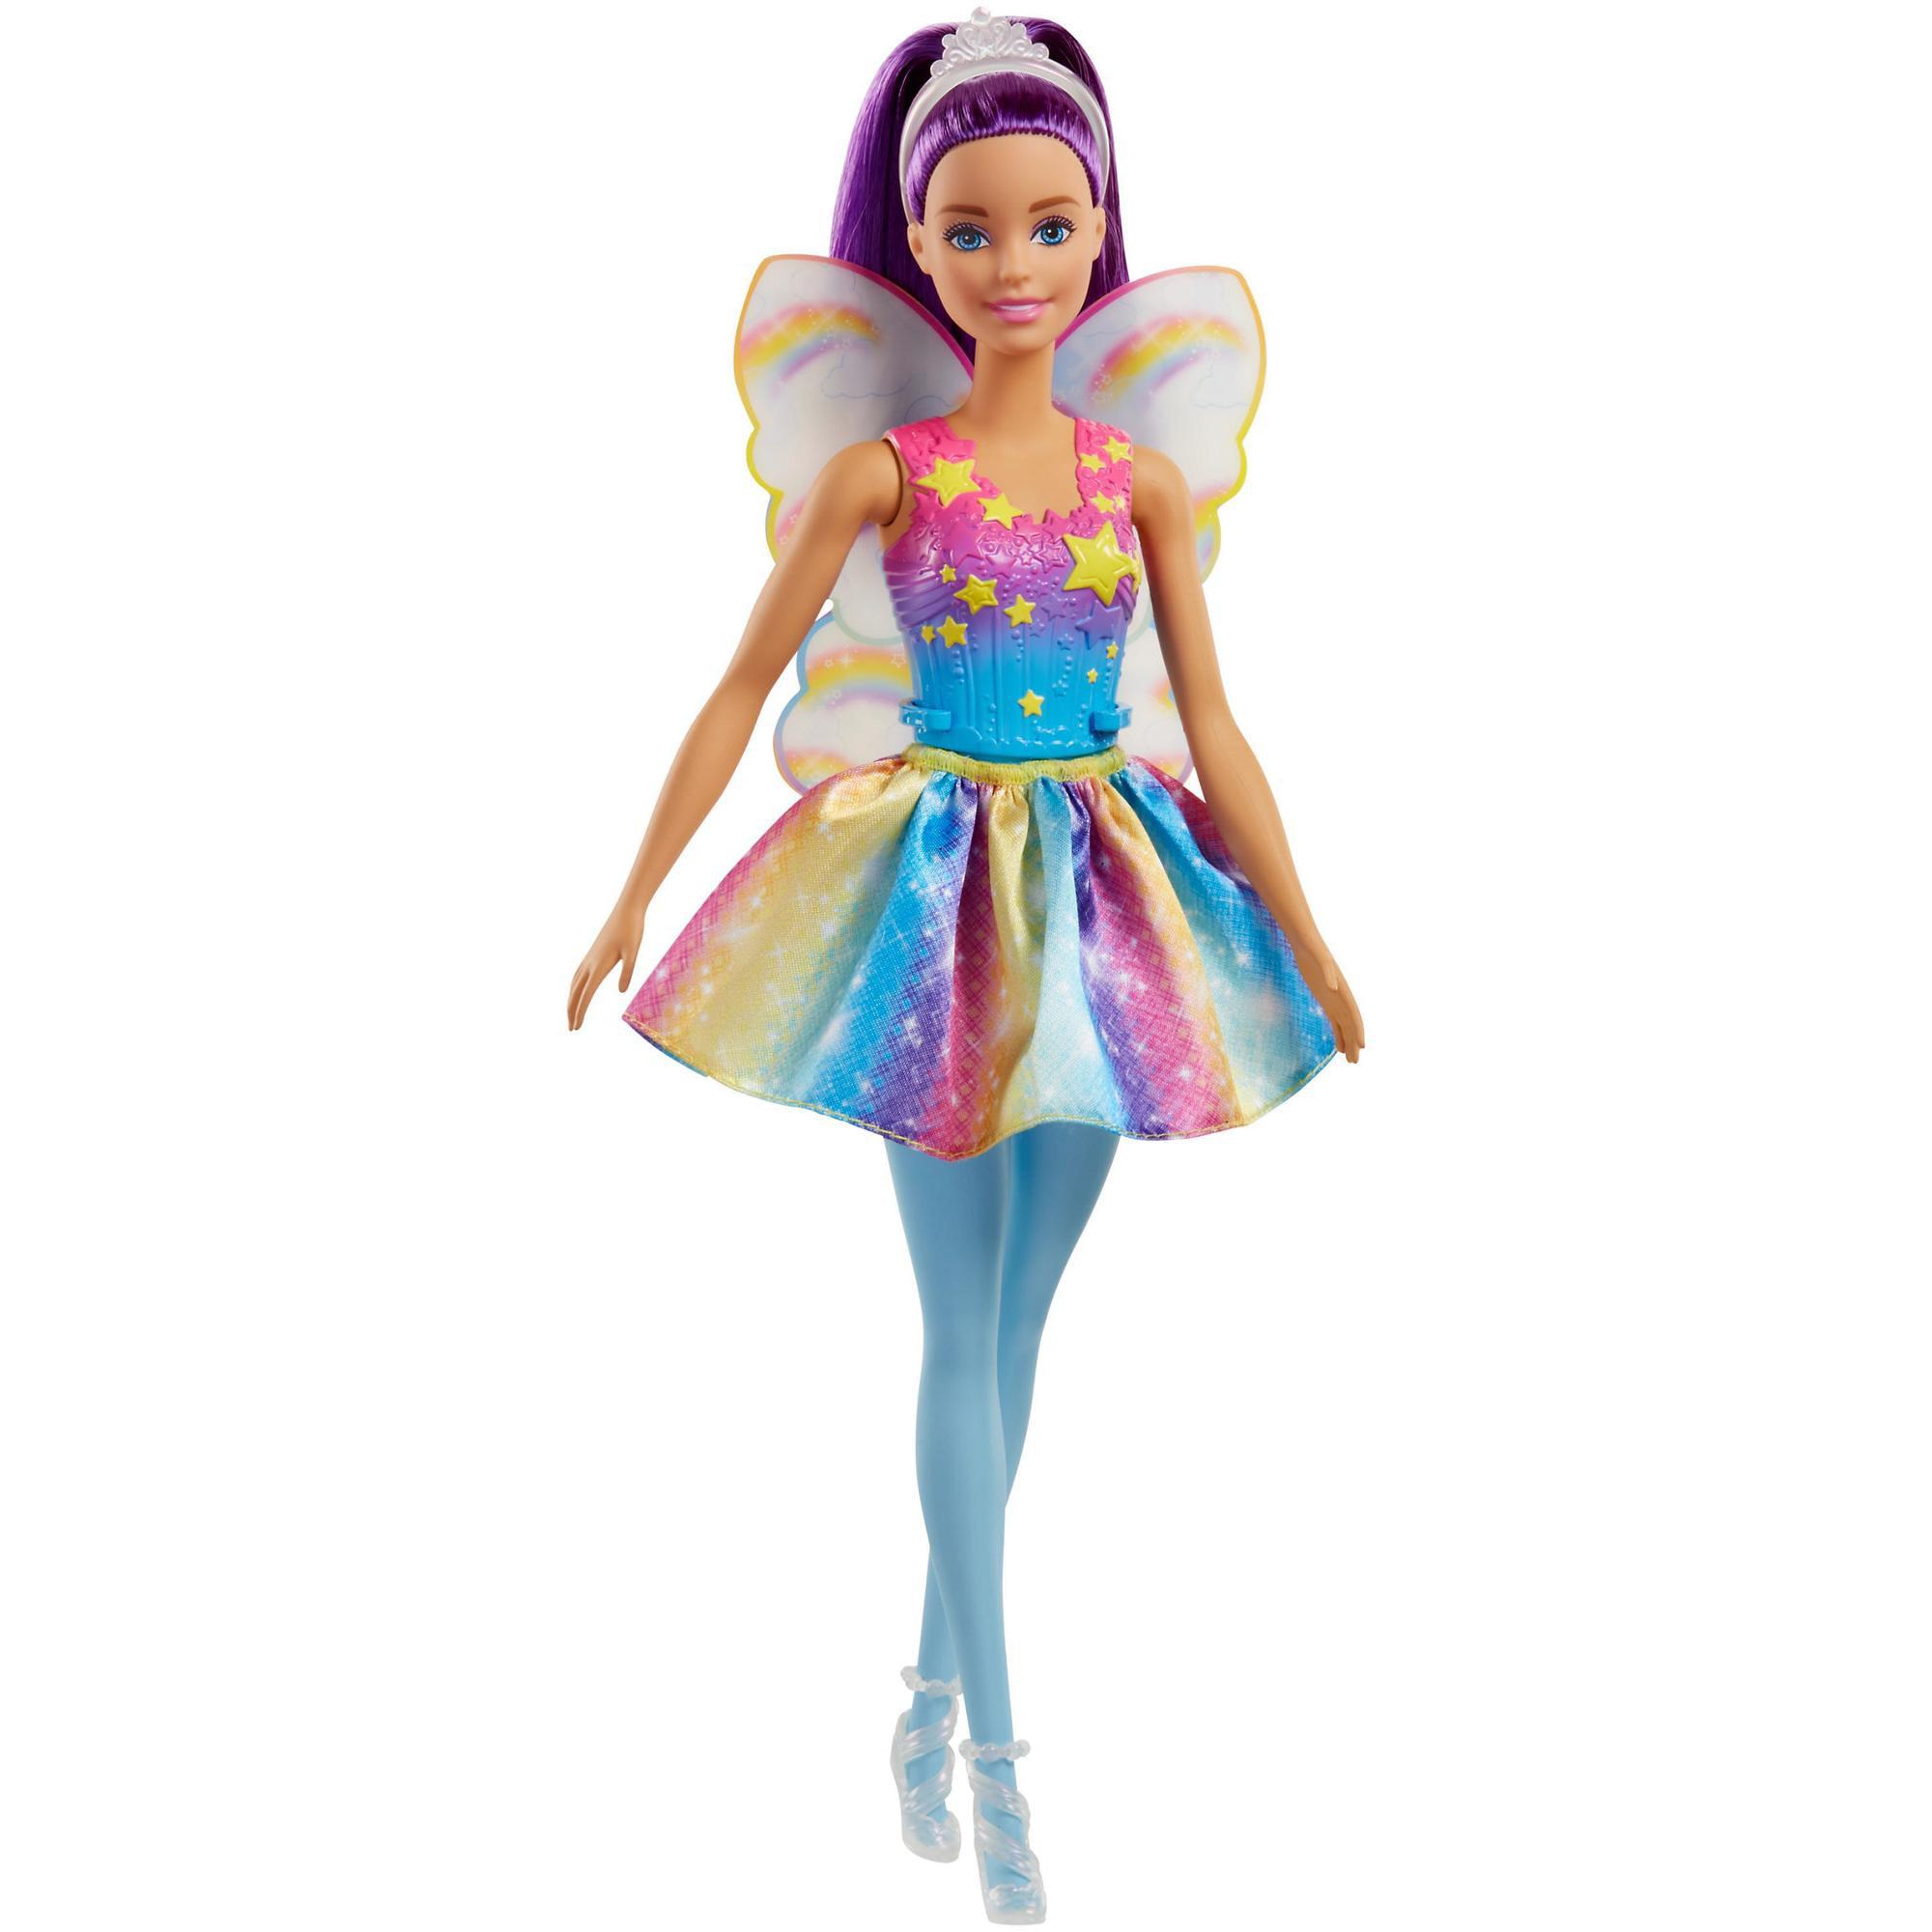 Barbie Dreamtopia Fairy Doll with Purple Hair & Rainbow Wings by Barbie